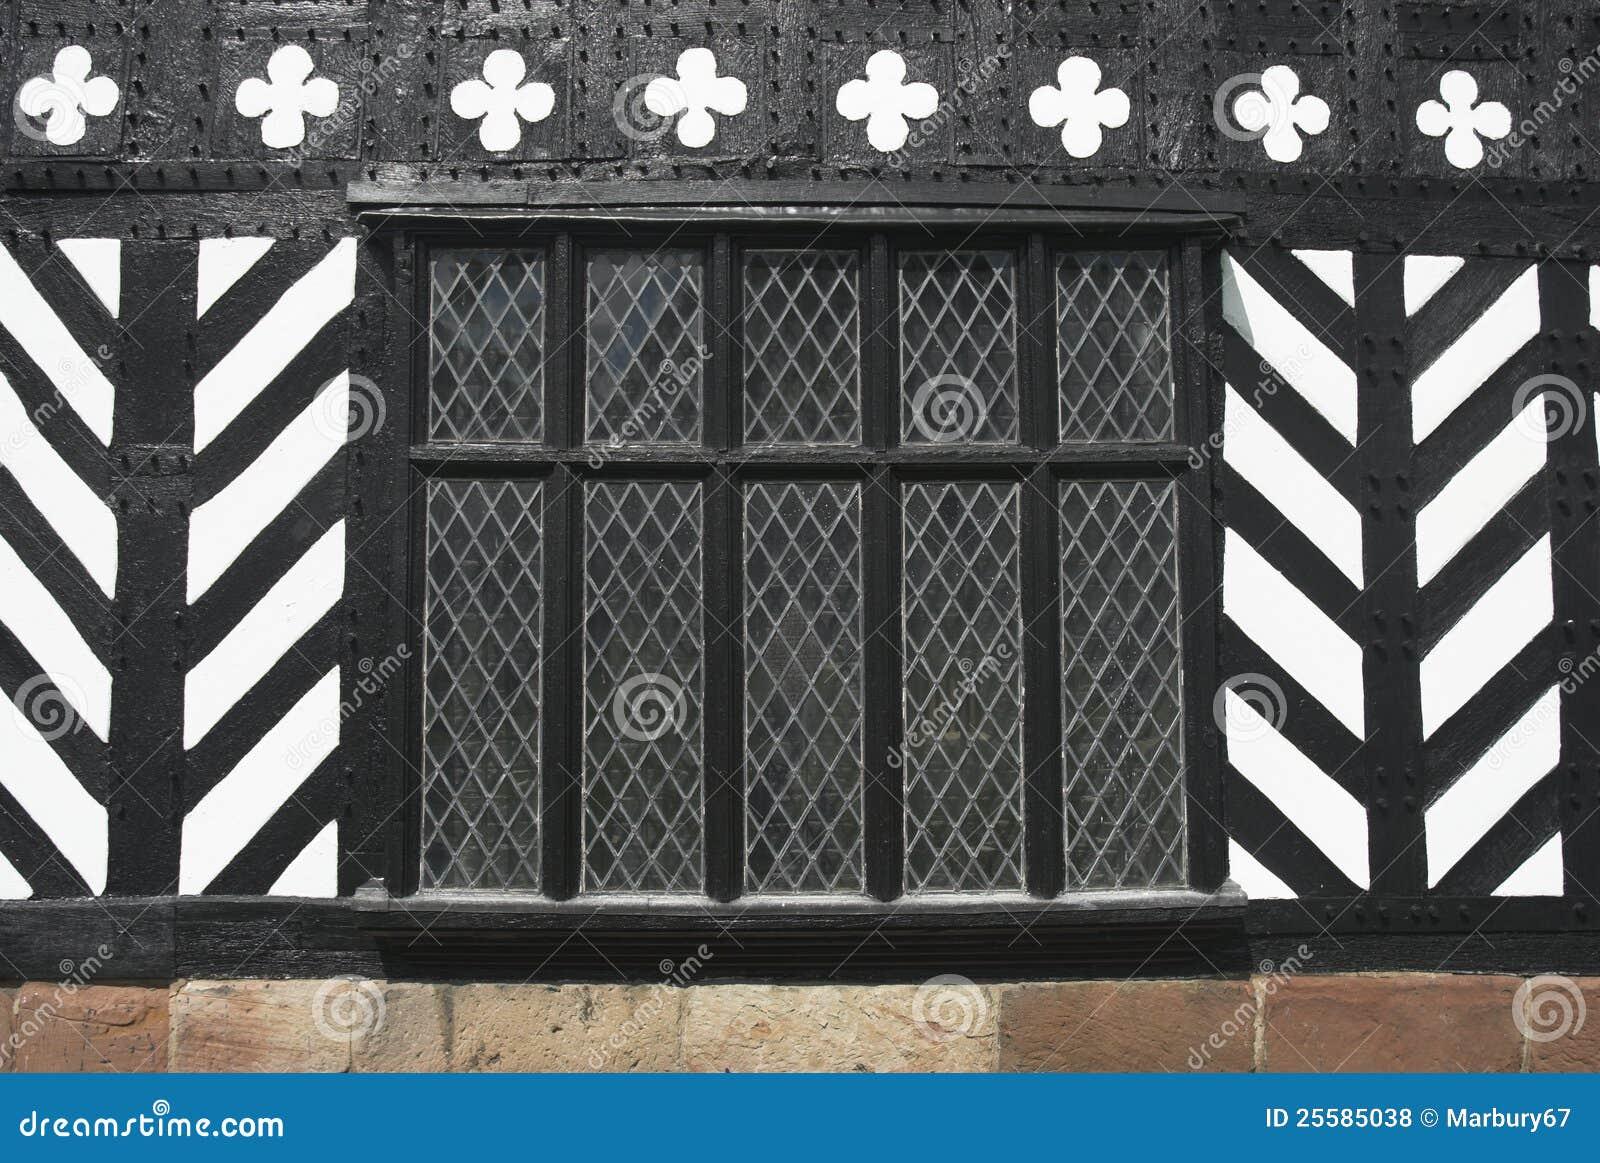 Tudor Windows tudor window stock photo - image: 64708706